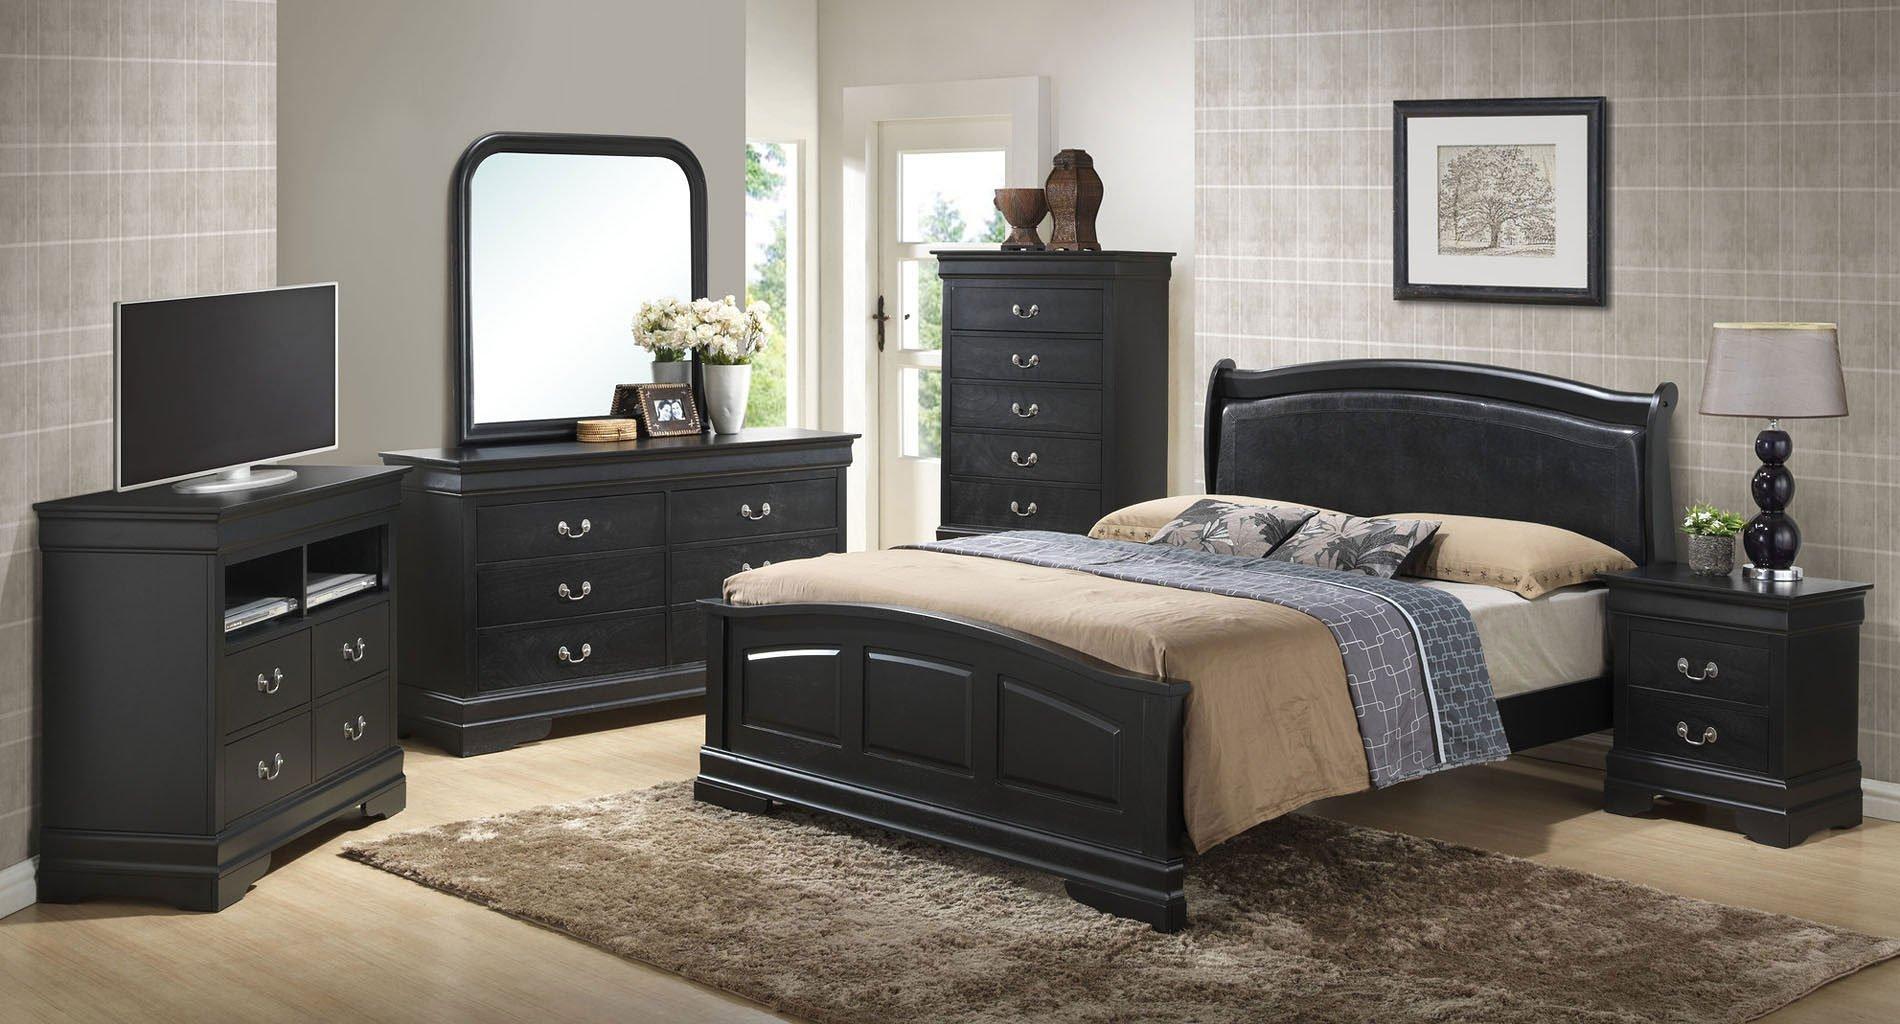 G3150 upholstered headboard bedroom set glory furniture furniture cart for Bedroom sets with upholstered headboards